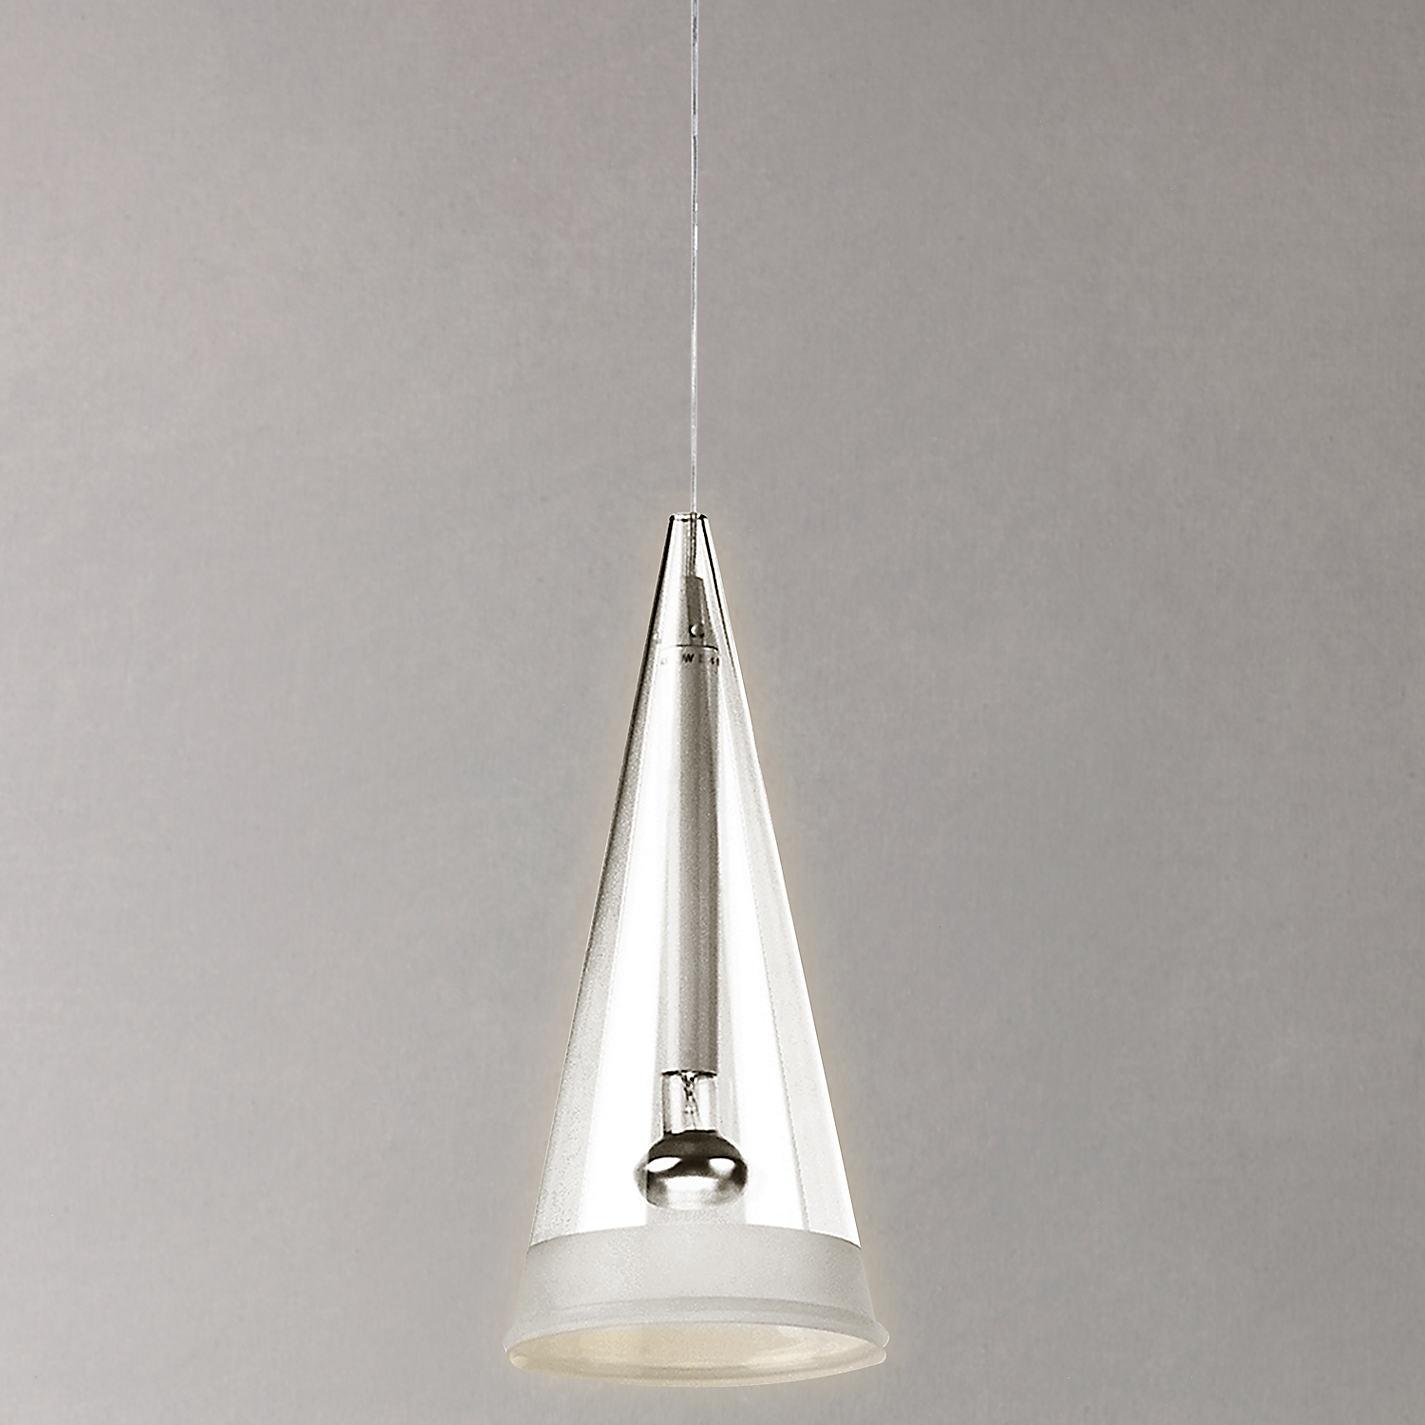 Buy flos fucsia 1 drop ceiling light john lewis buy flos fucsia 1 drop ceiling light online at johnlewis aloadofball Gallery